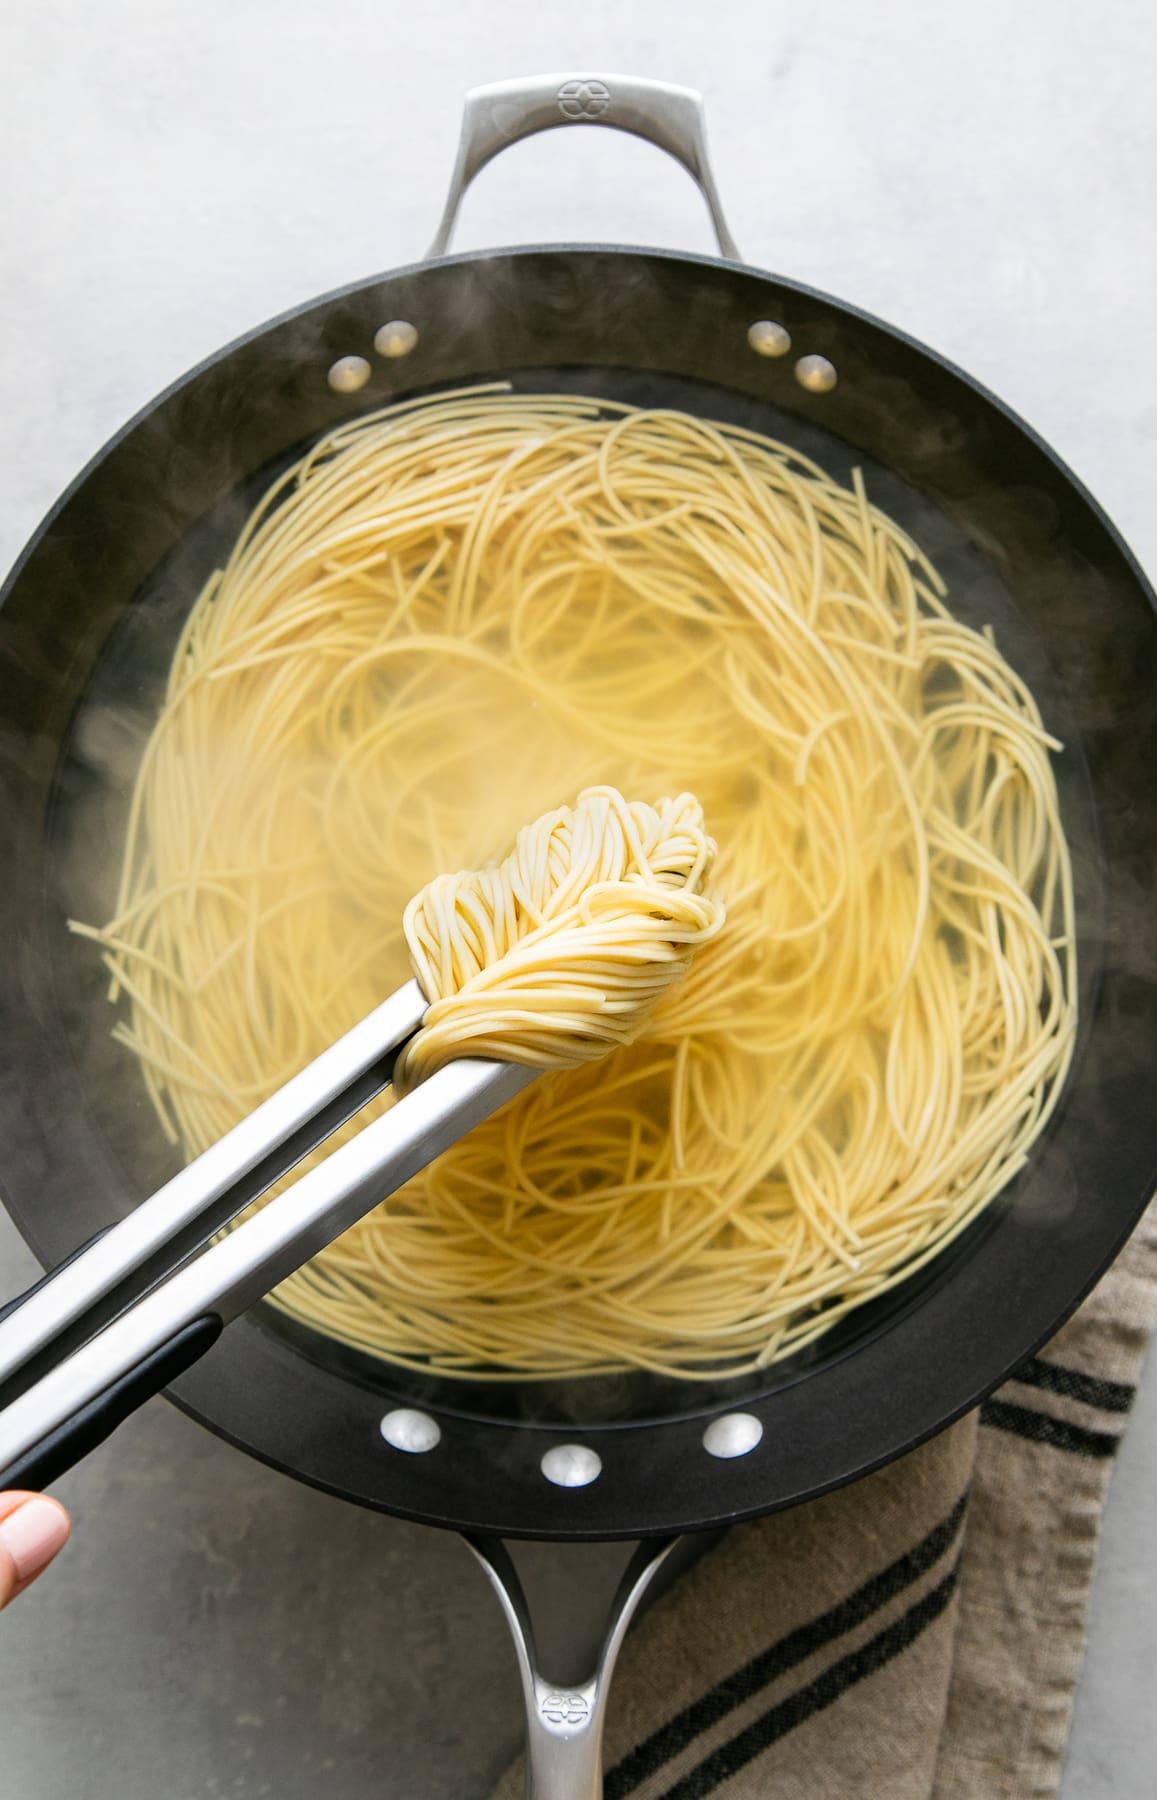 top down view of cooked ramen noodles between tongs.